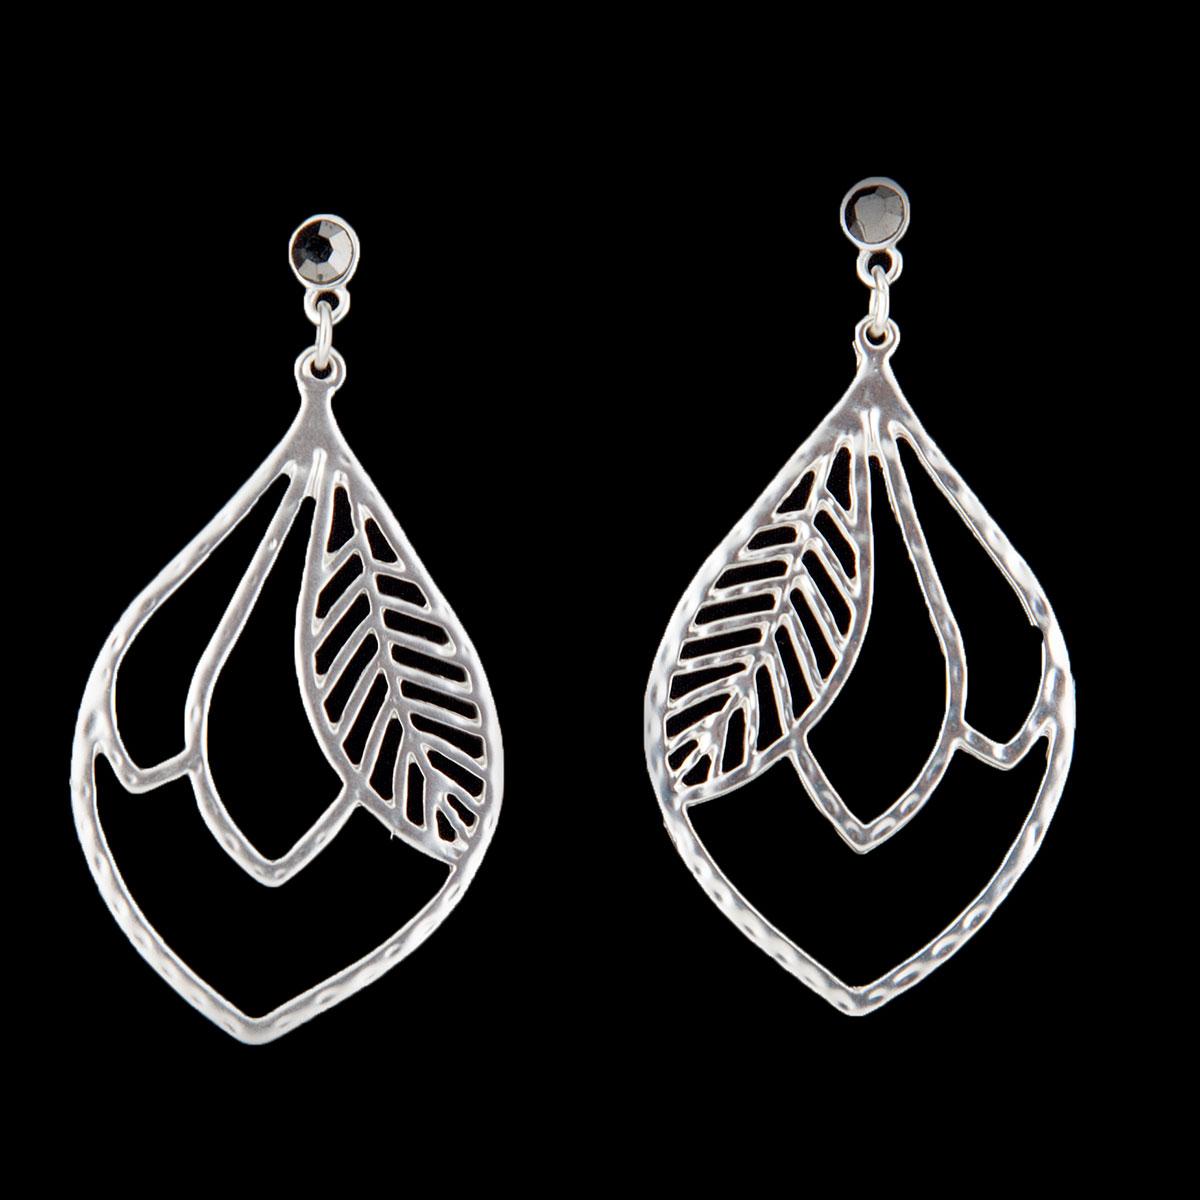 "Satin Silver 1.25""x2.5"" Leaf Post Earrings"